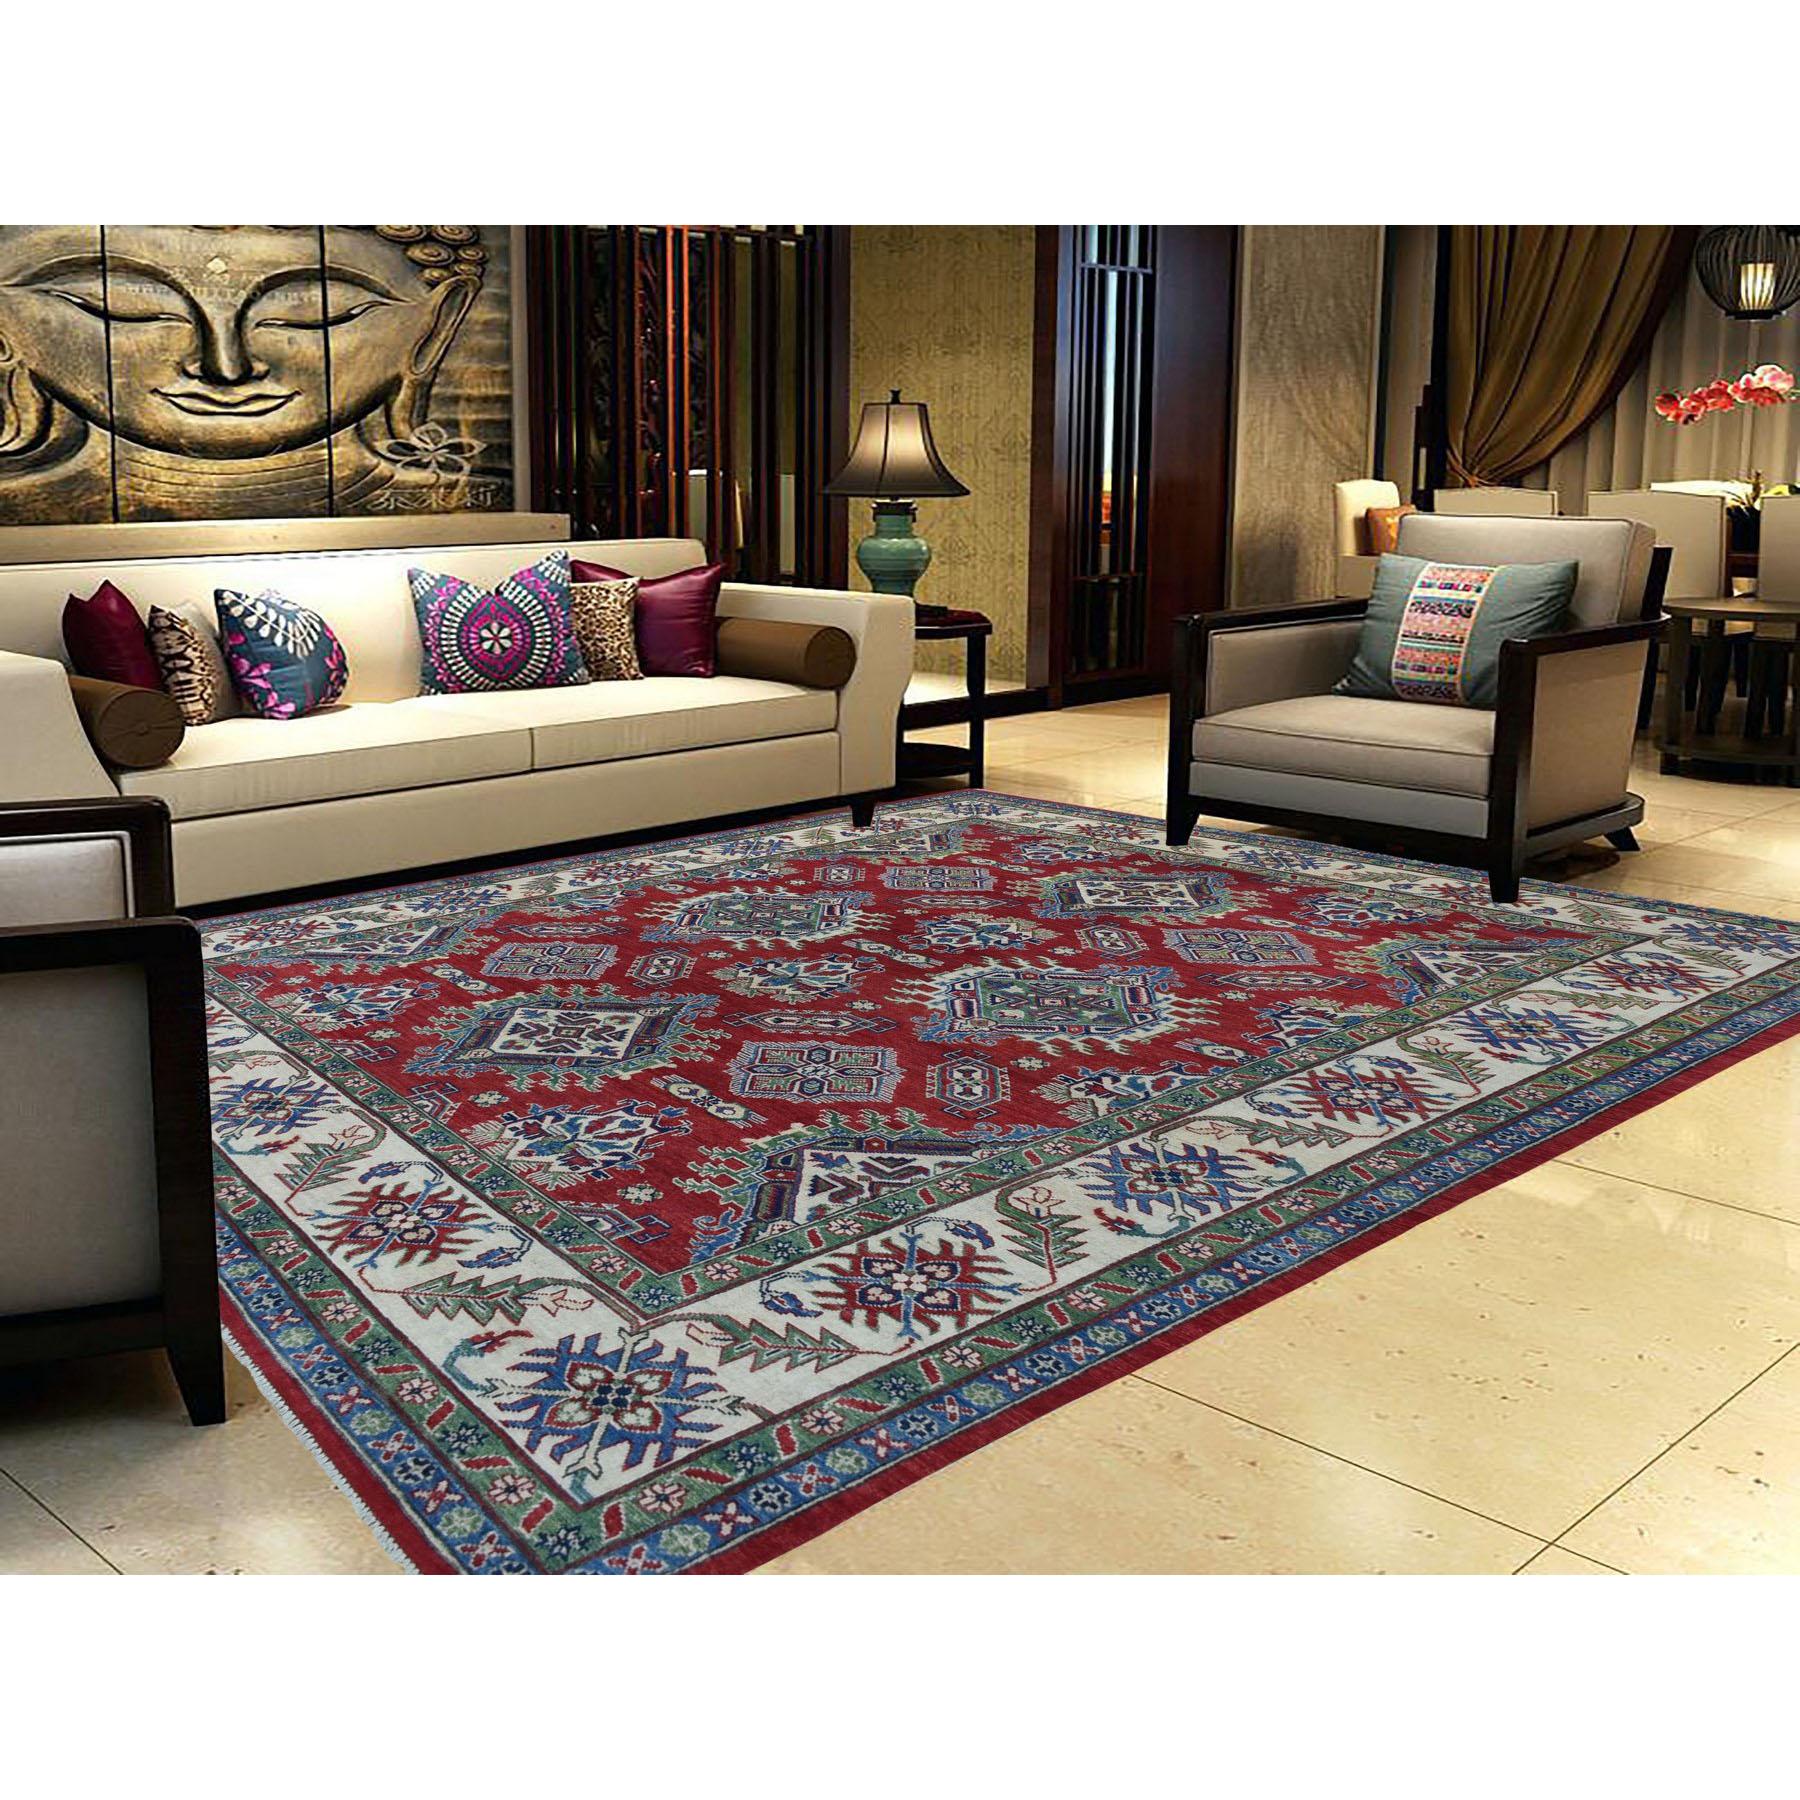 "8'x10"" Red Kazak Geometric Design Pure Wool Hand-Knotted Oriental Rug"